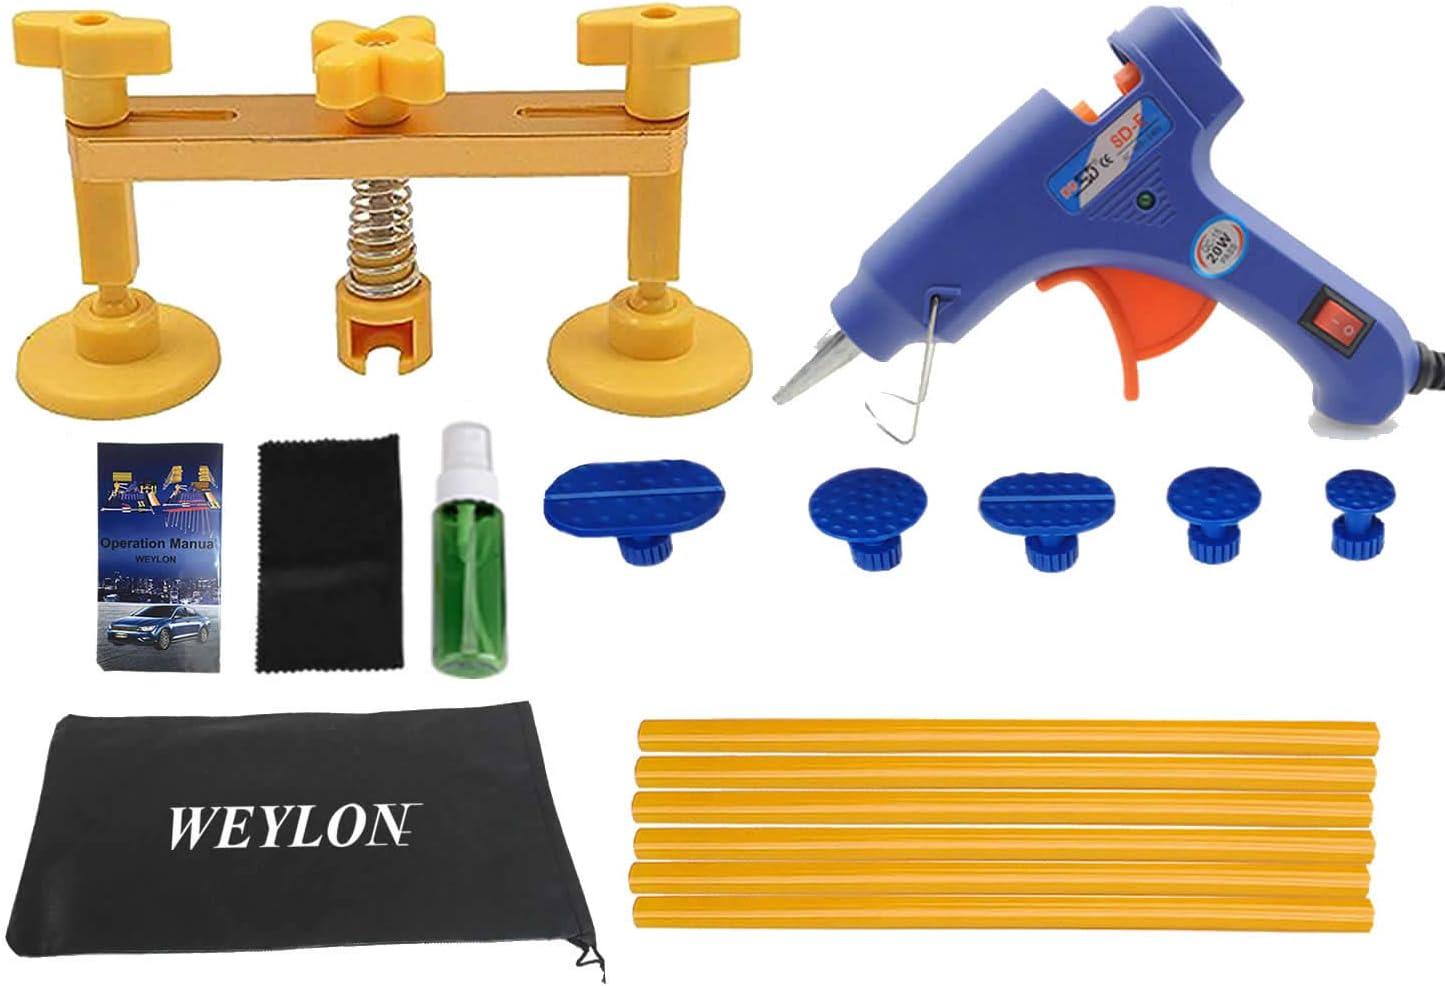 Weylon 14pcs Auto Paintless Dent Removal Werkzeuge Kleber Gun Bridge Puller Reparatur Werkzeug Kits Ops Ein Dent Ding Pdr Tools Auto